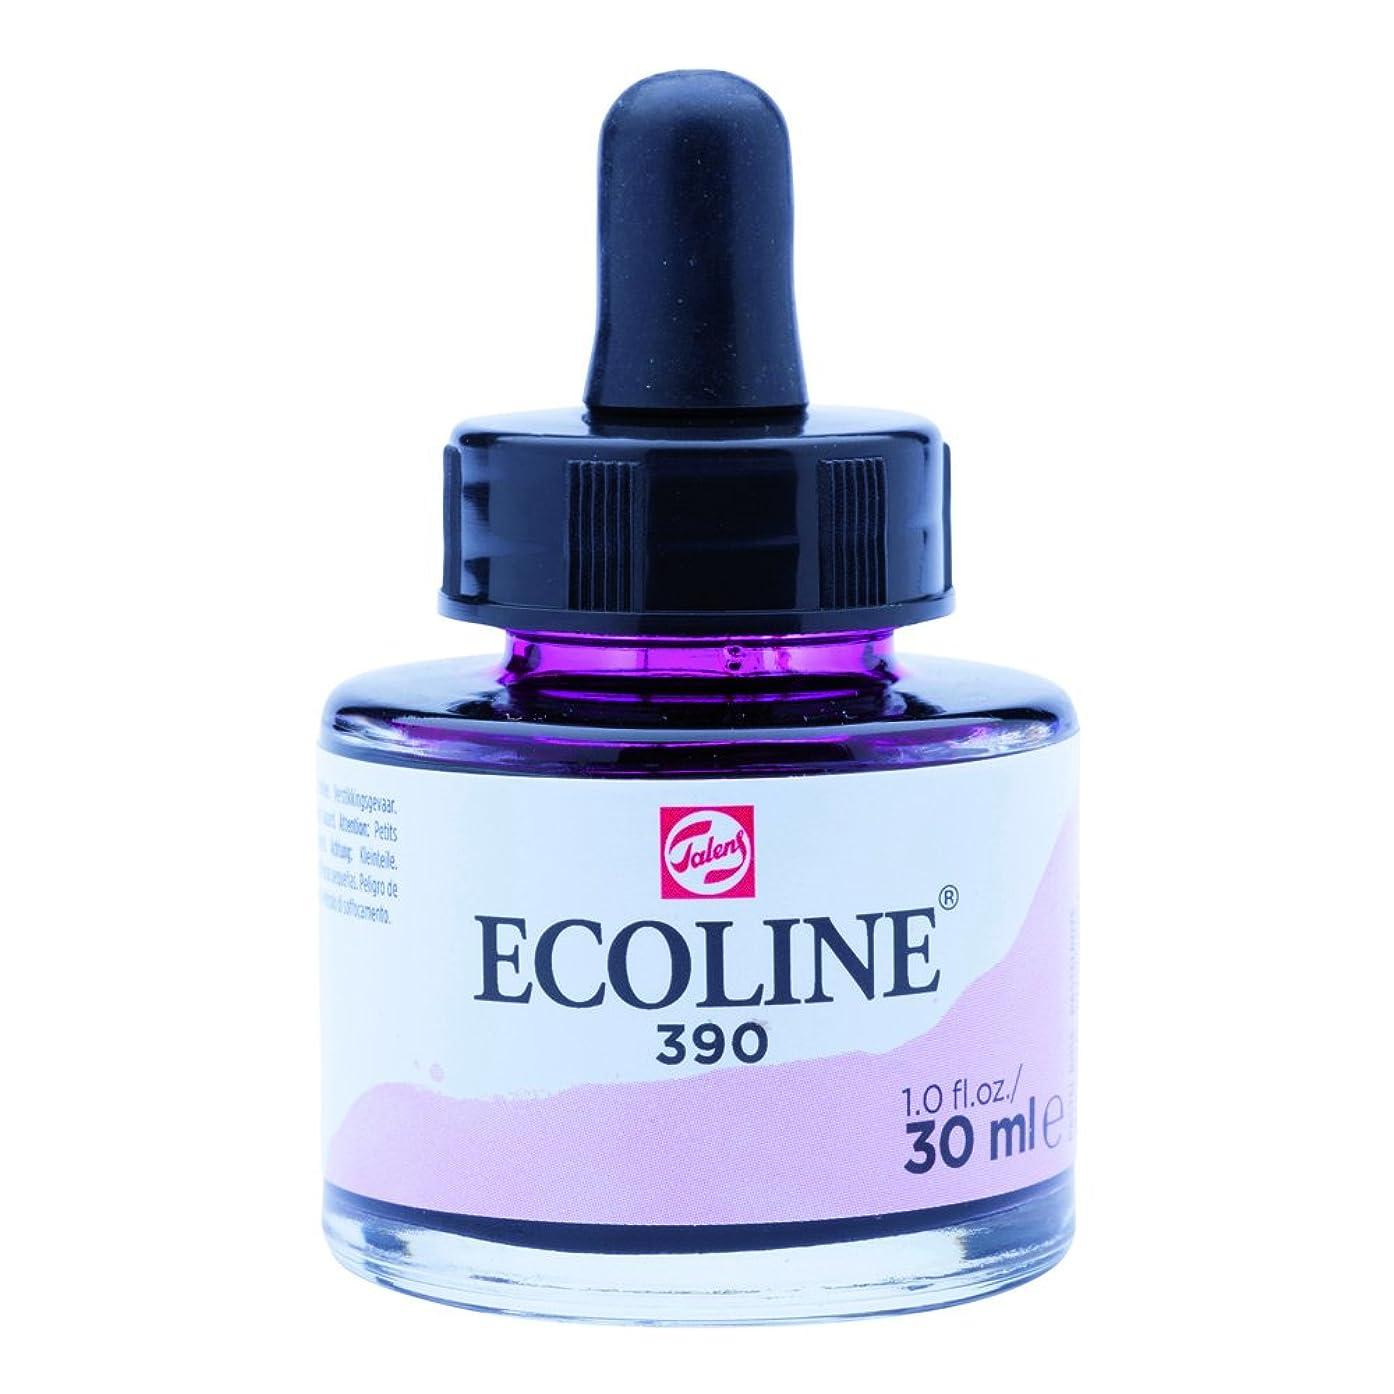 Ecoline Liquid Watercolor 30ml Pipette Jar - Pastel Rose (11253901)